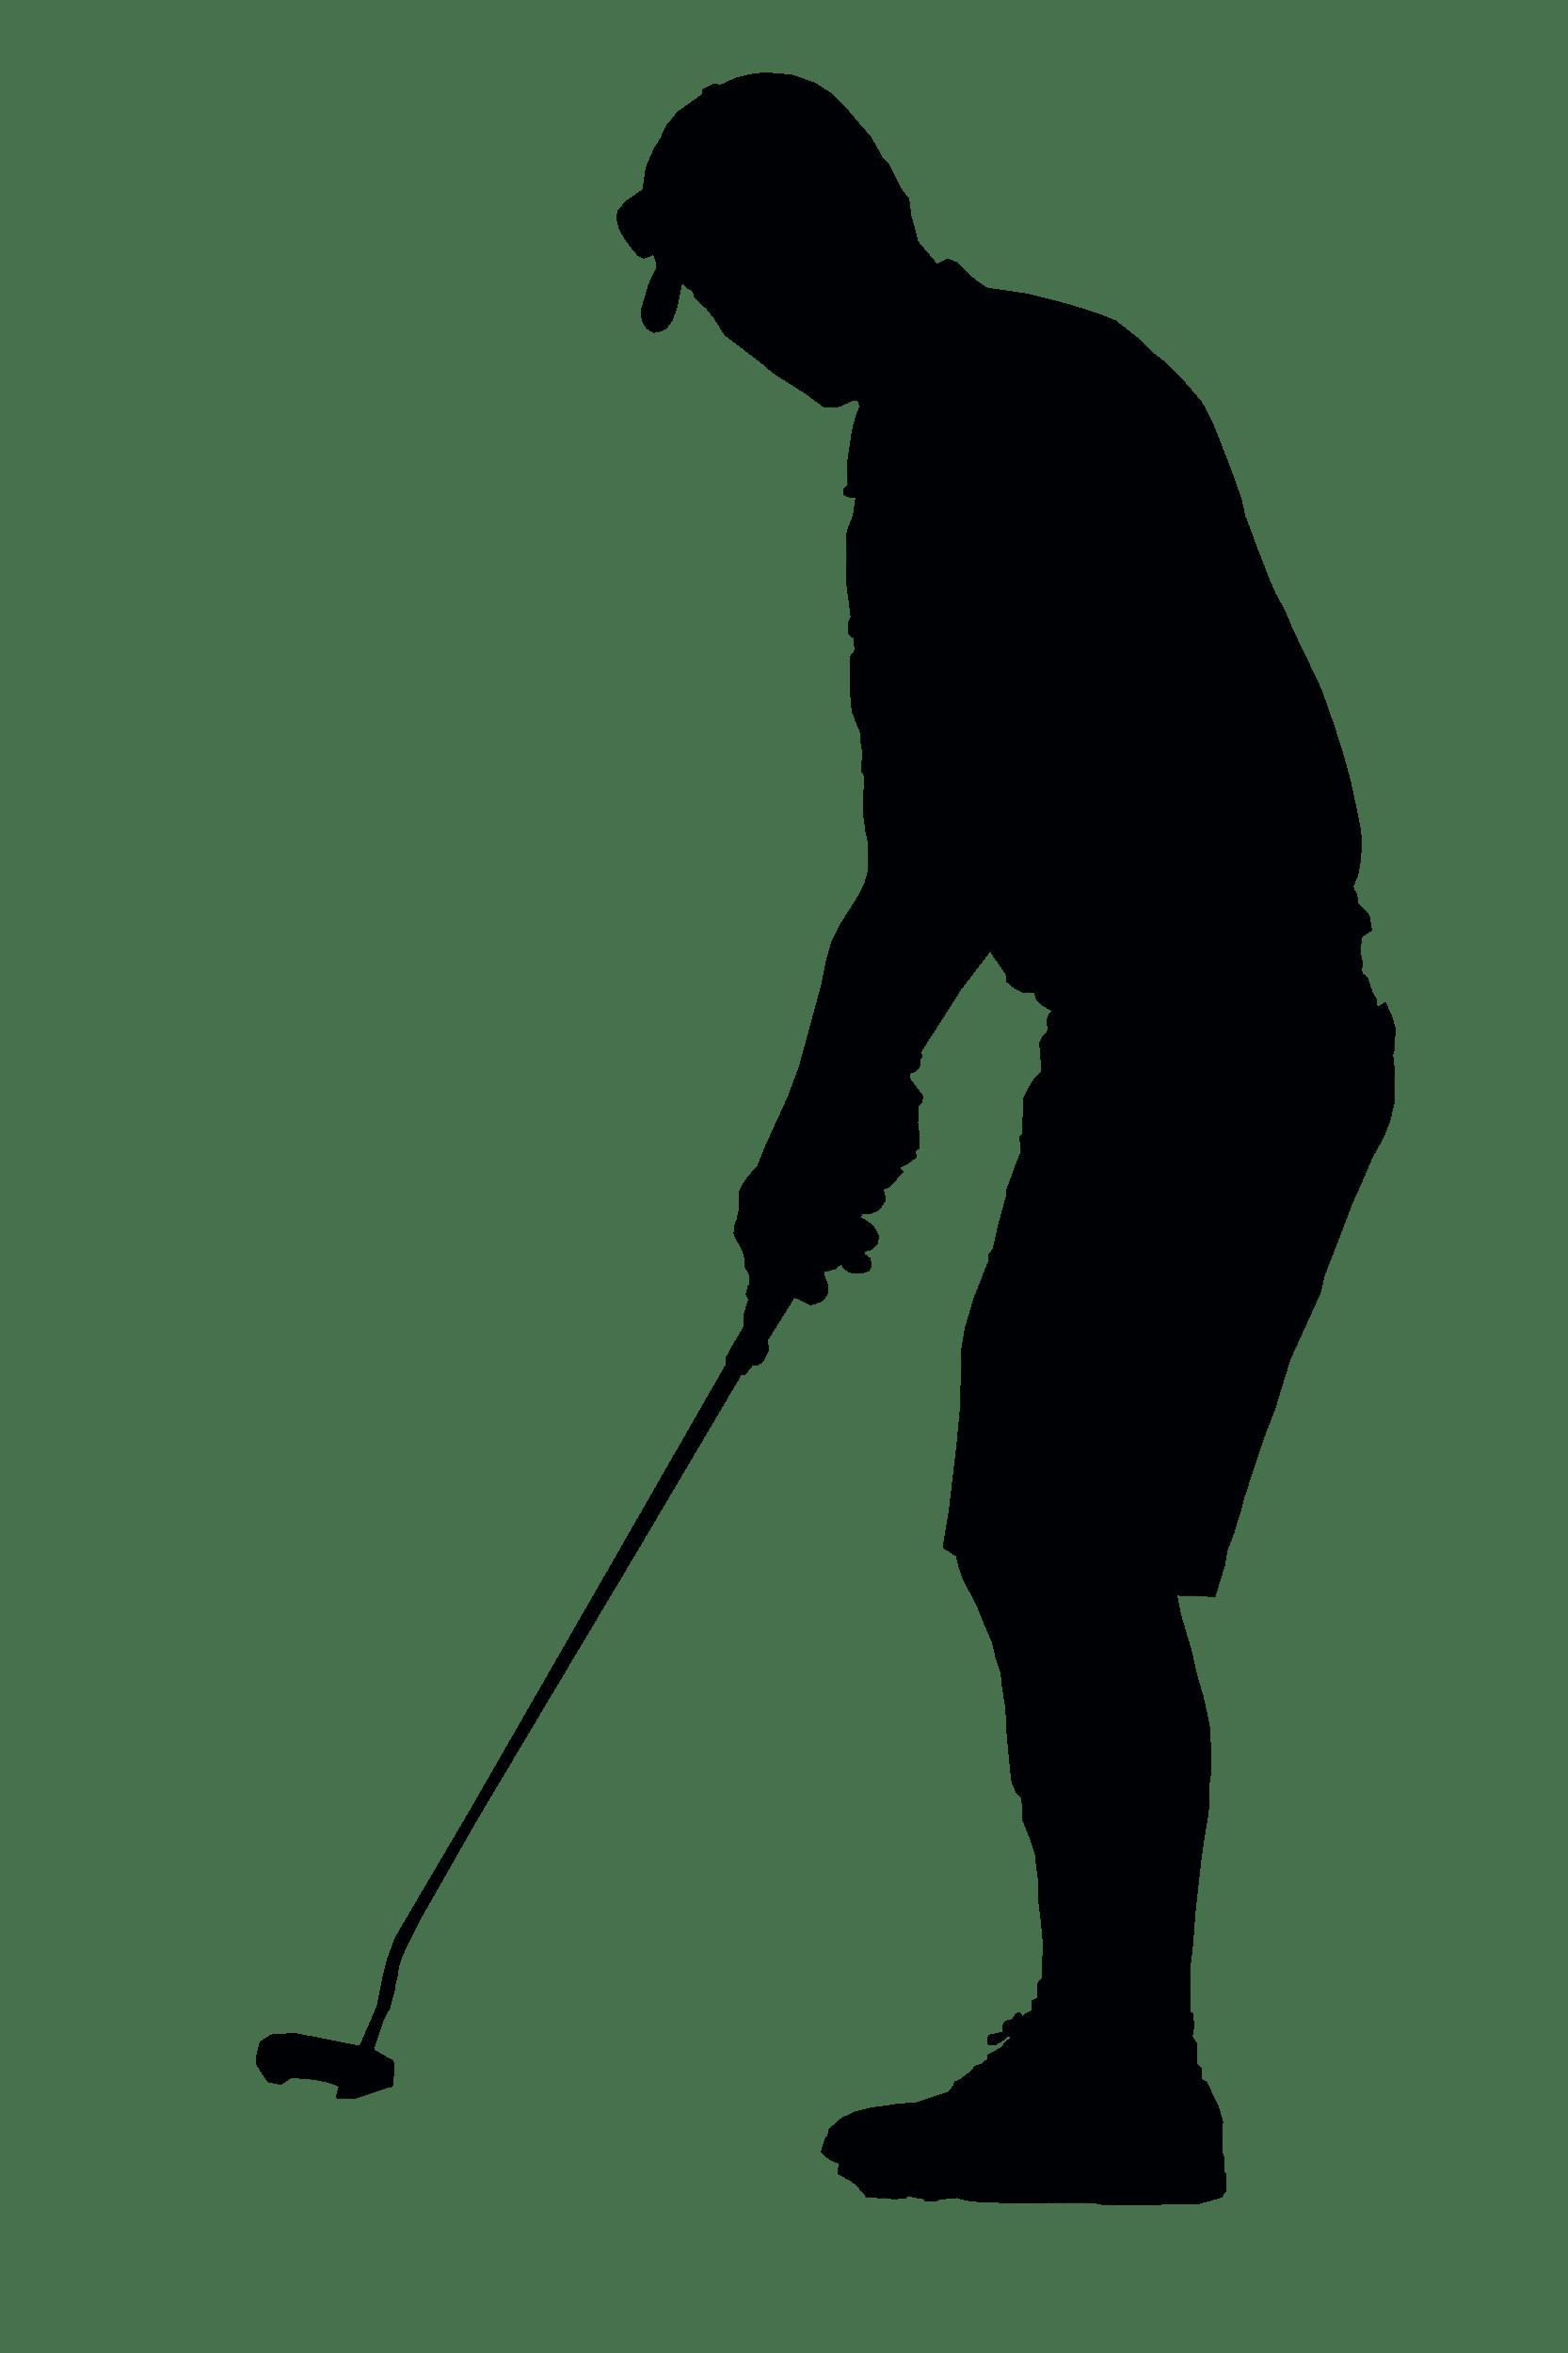 1666x2500 Golfer Black Silhouette Transparent Png